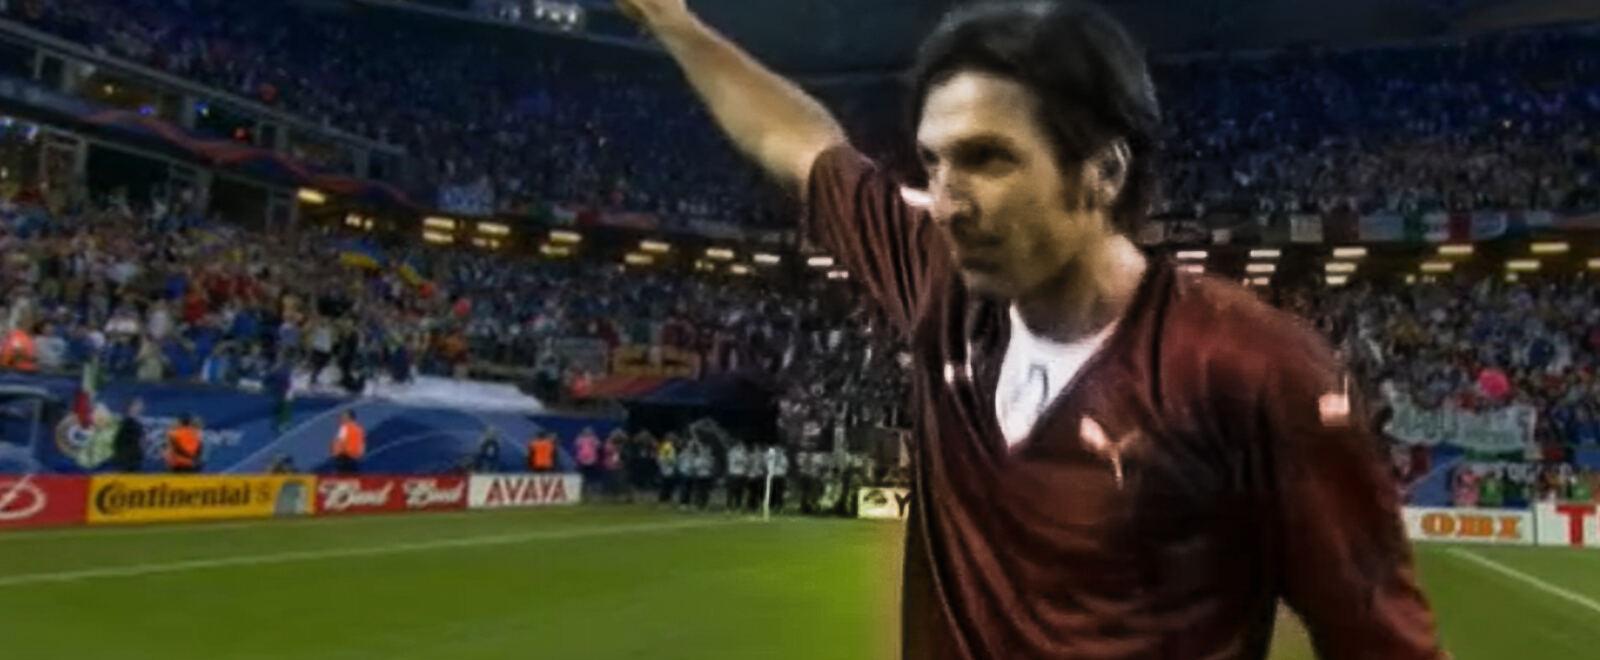 Emozioni Mondiali: The story of 2006